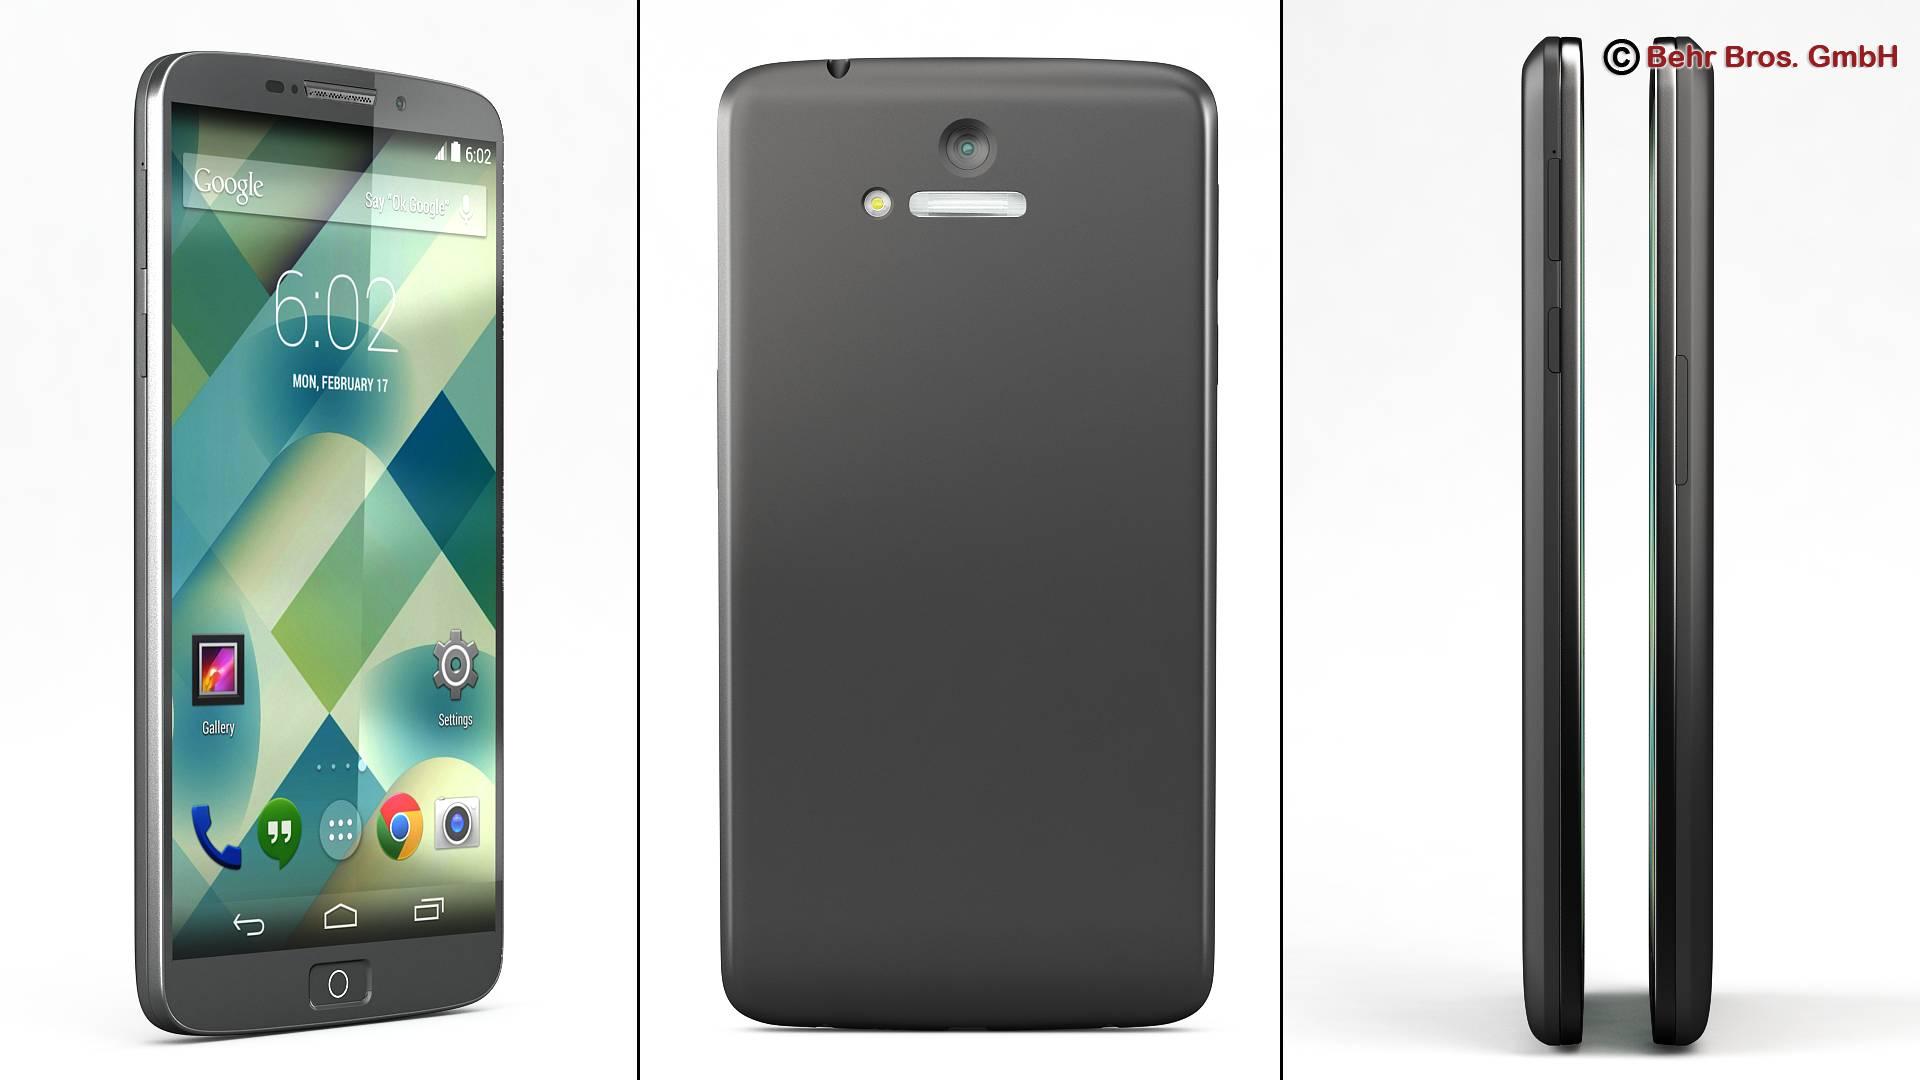 generic smartphone 6 inch 3d model 3ds max fbx c4d lwo ma mb obj 161659